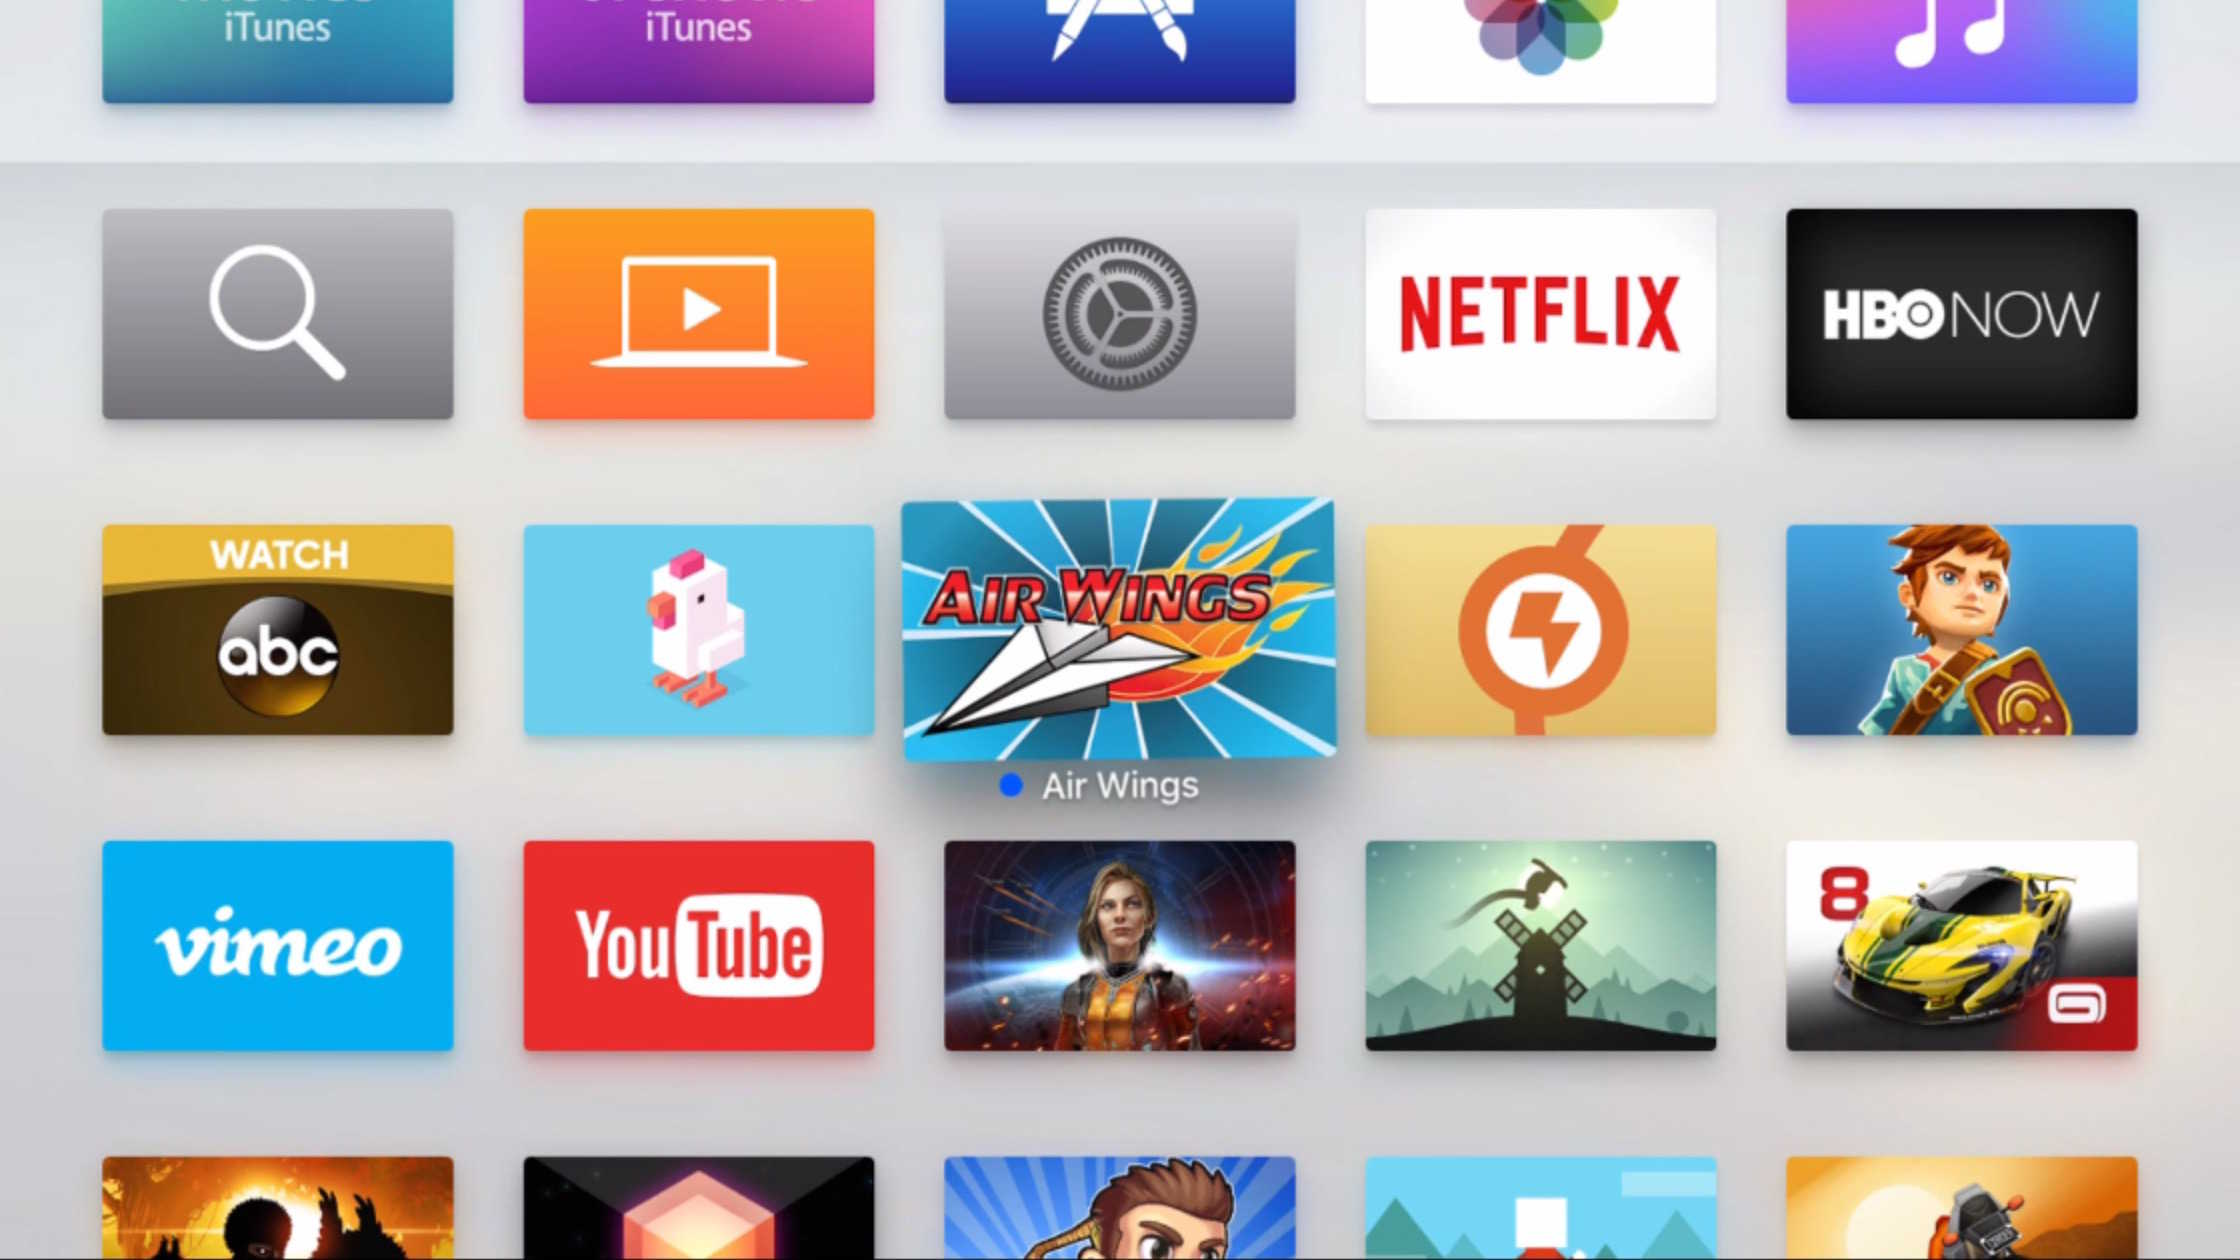 5 hidden remote touchpad tricks will make you an Apple TV expert